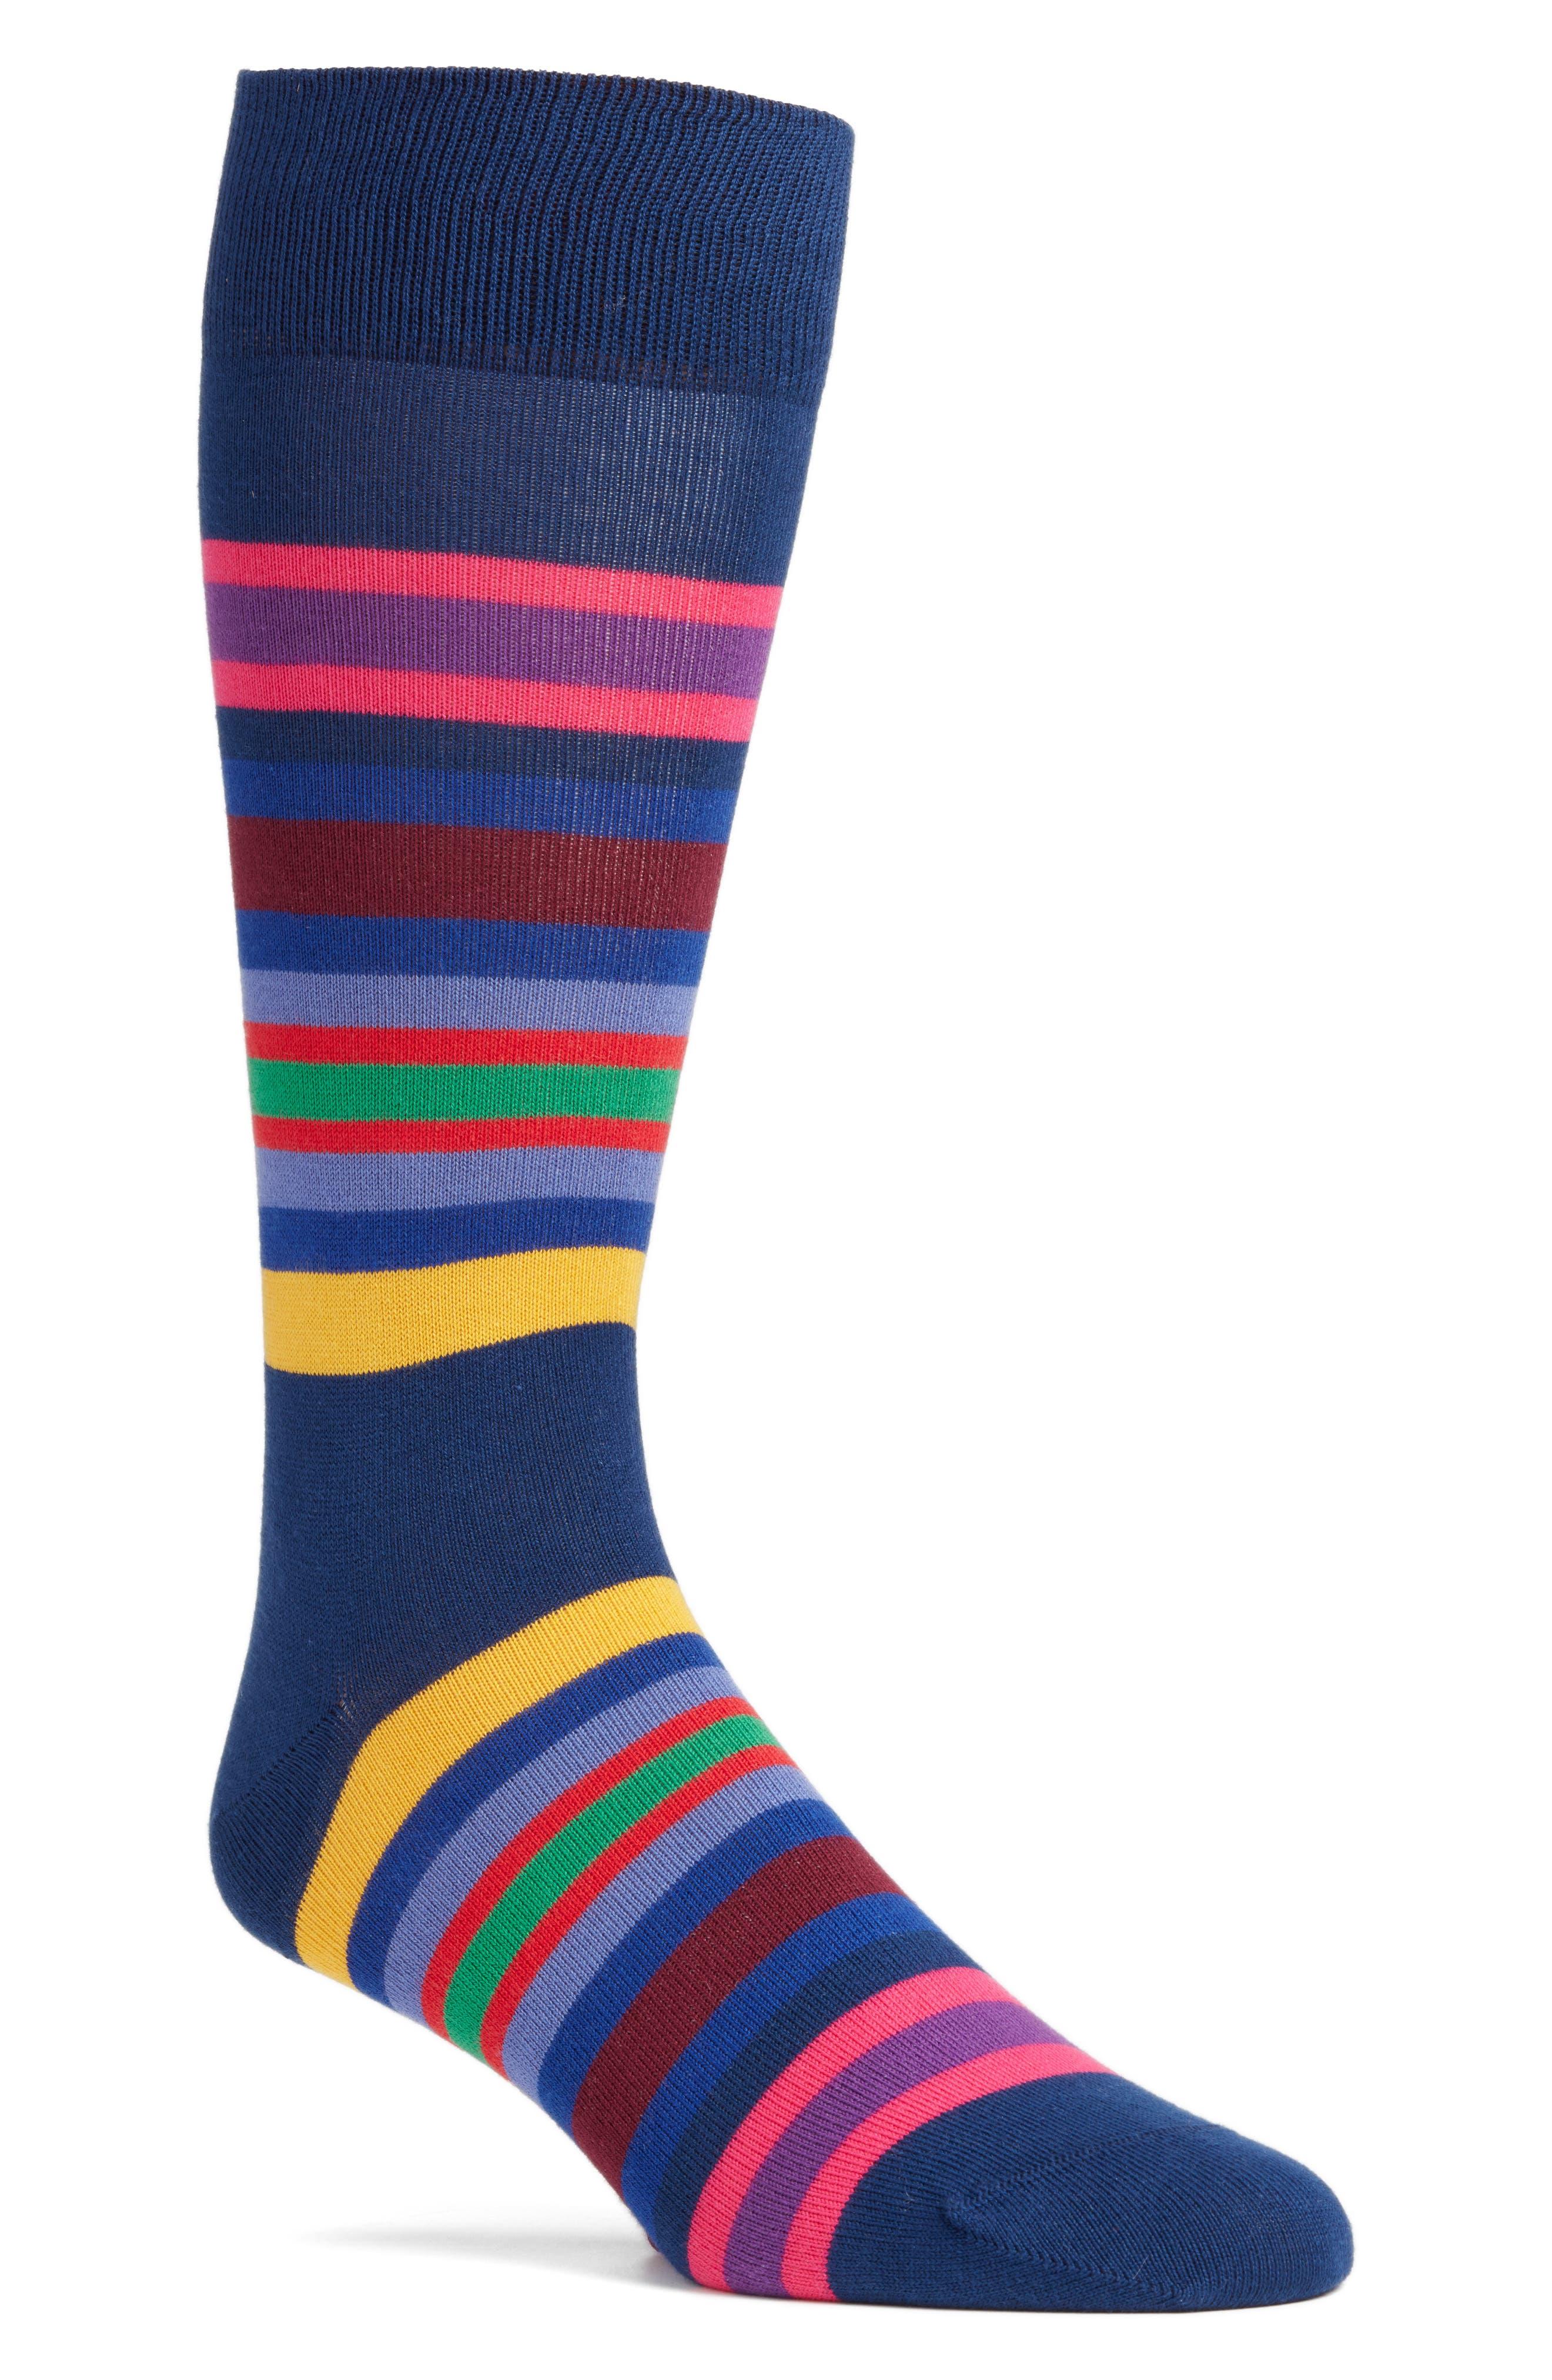 Paul Smith Kew Stripe Crew Socks